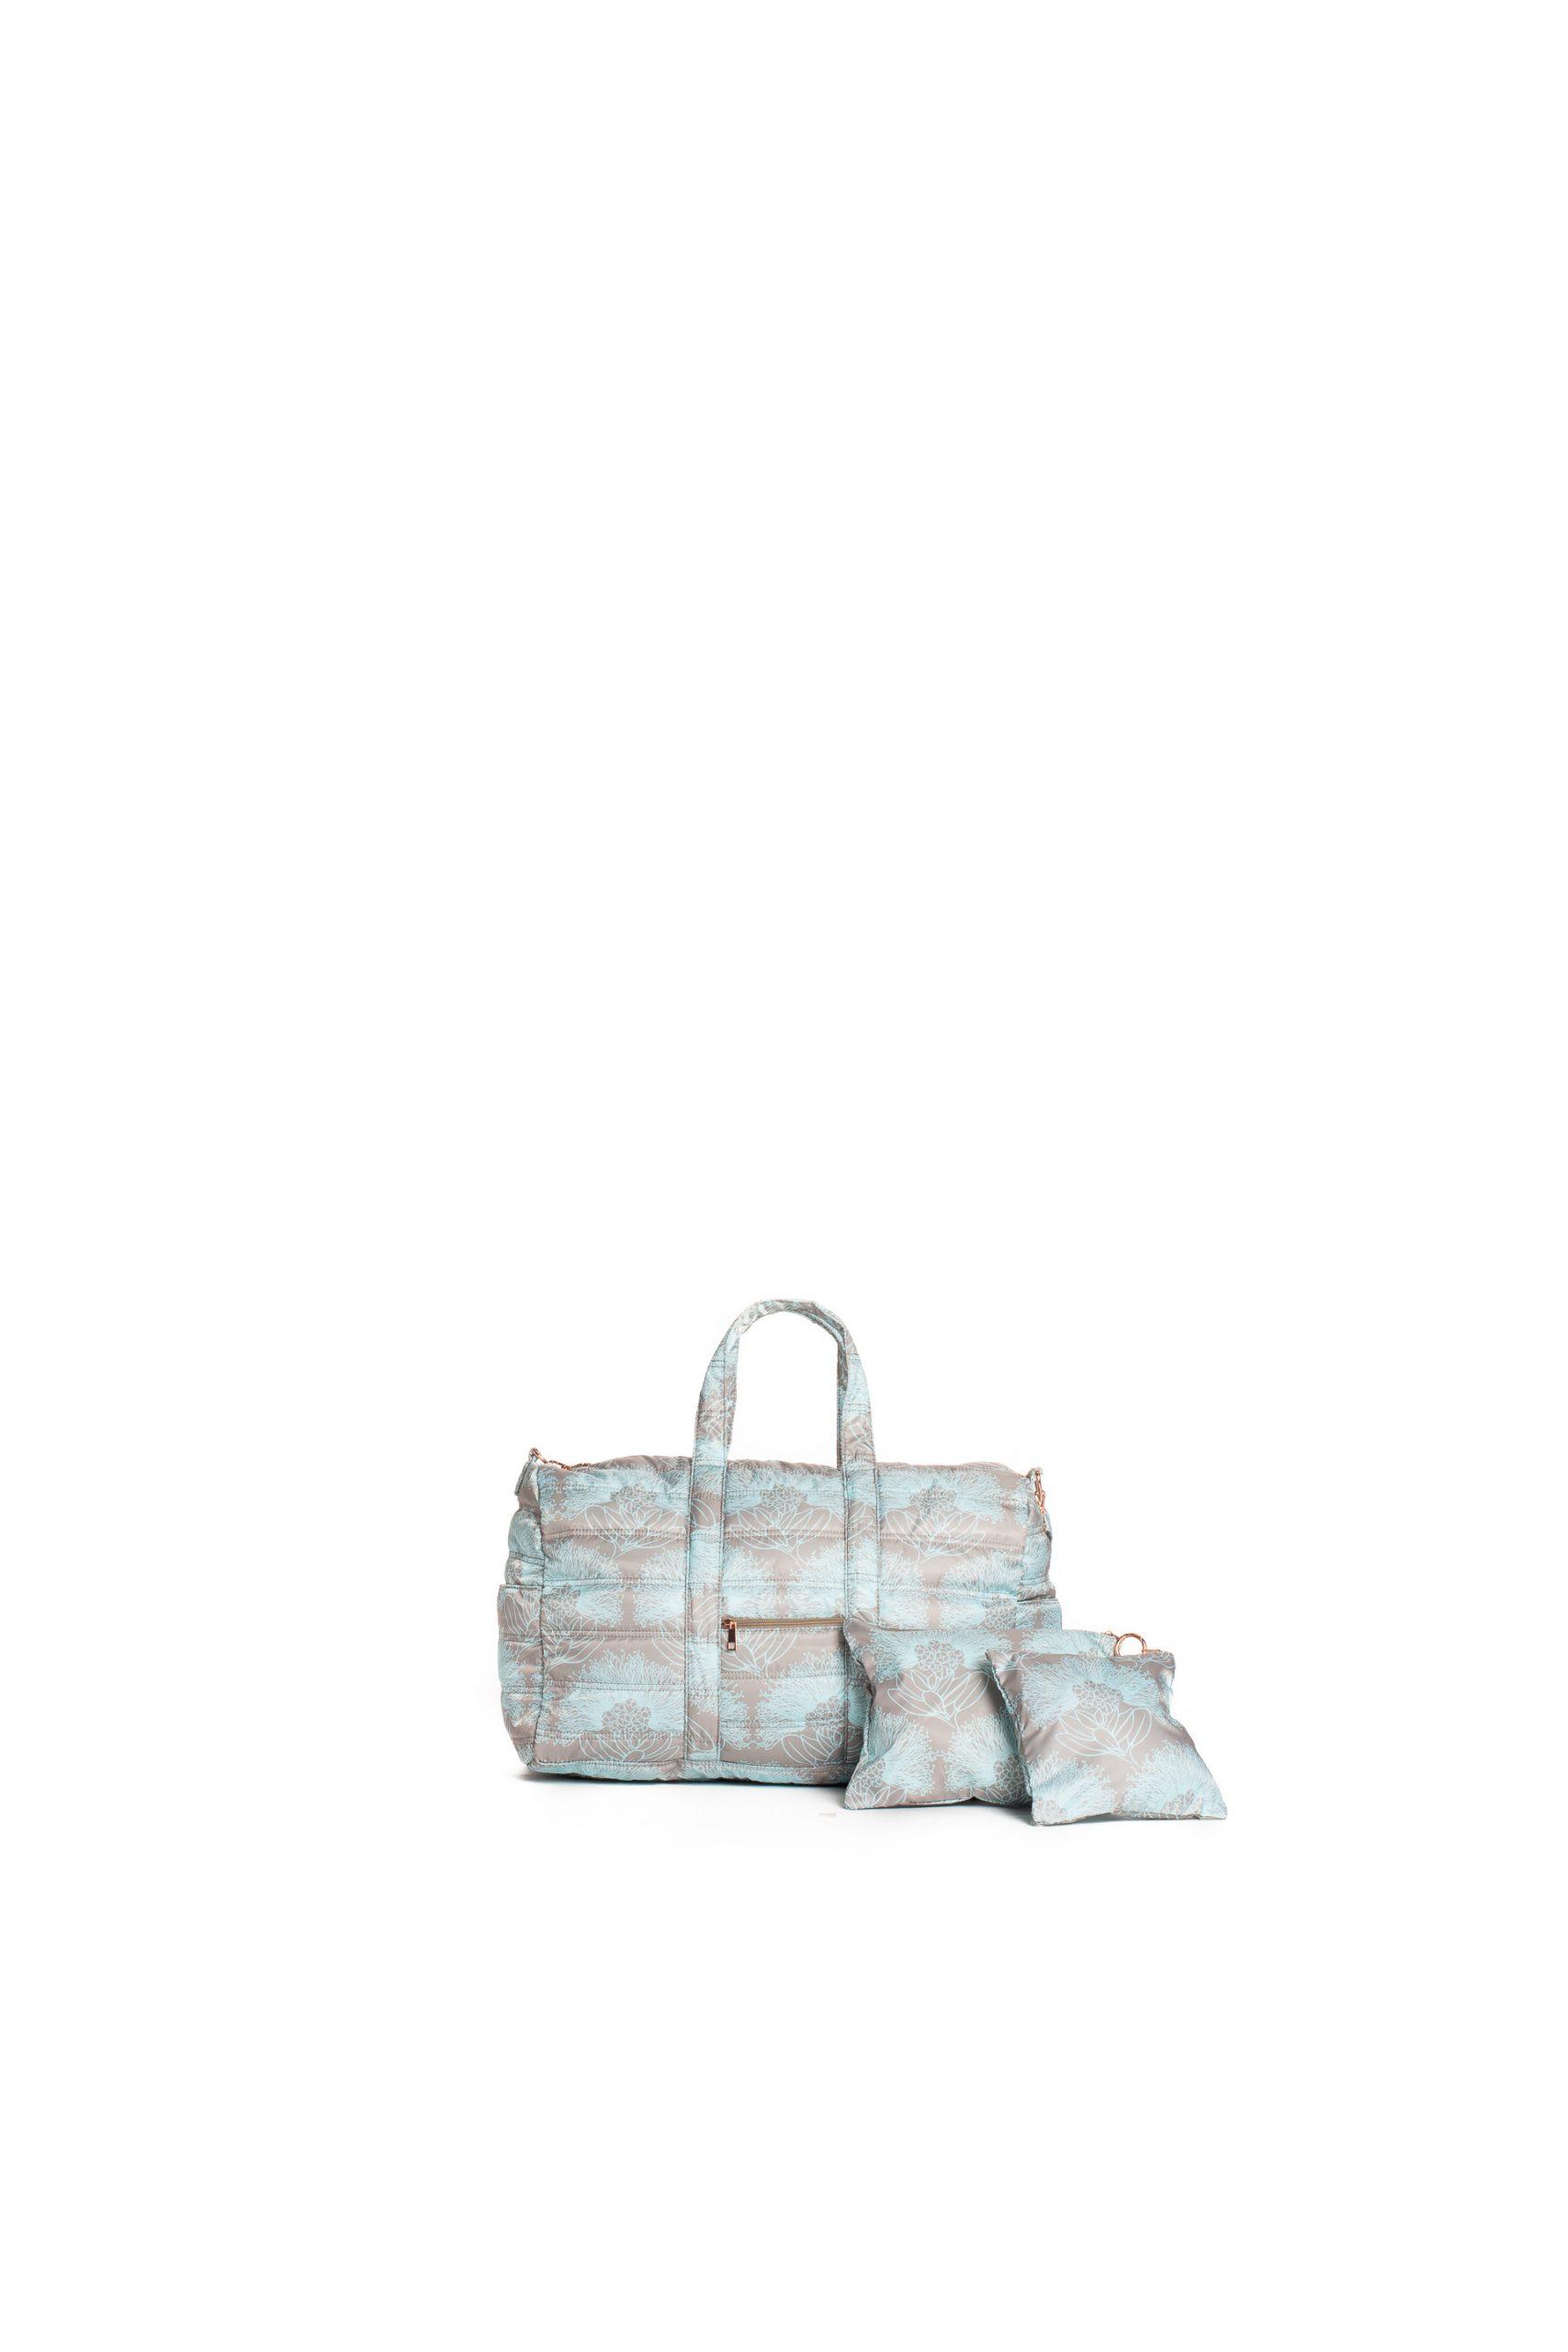 Laulea Bag in Kalihilehua Blue